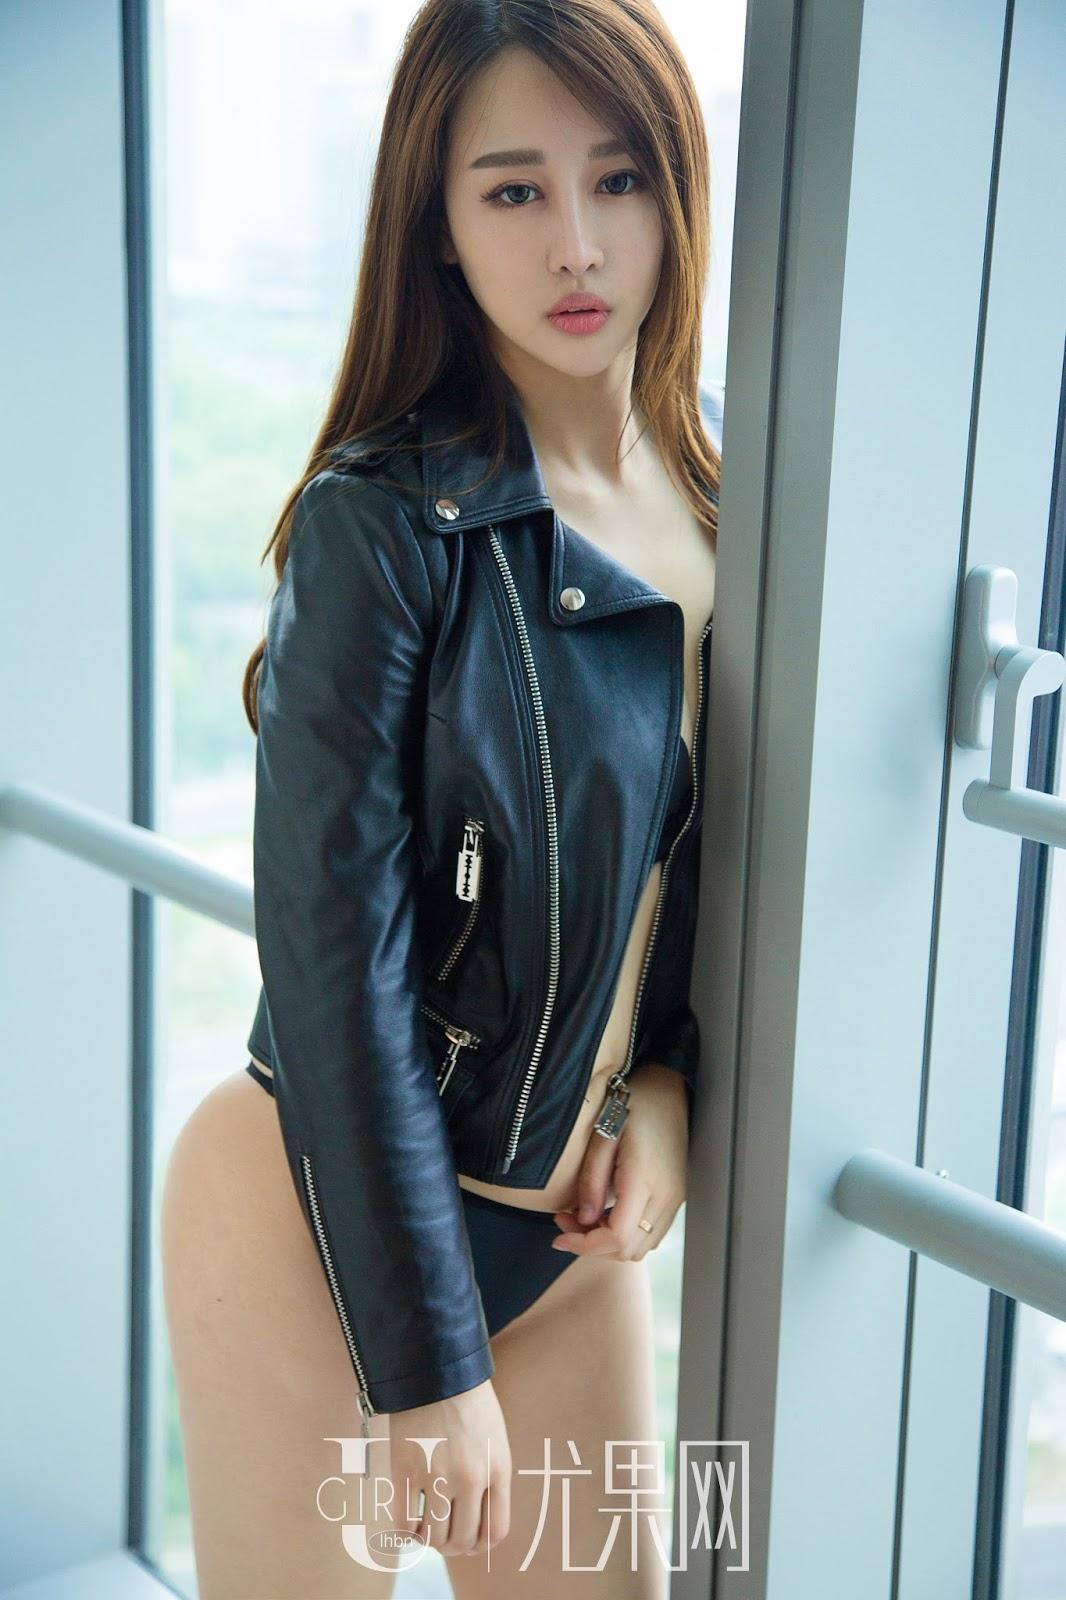 xxx nude girls: Choi Yu Jung in Black